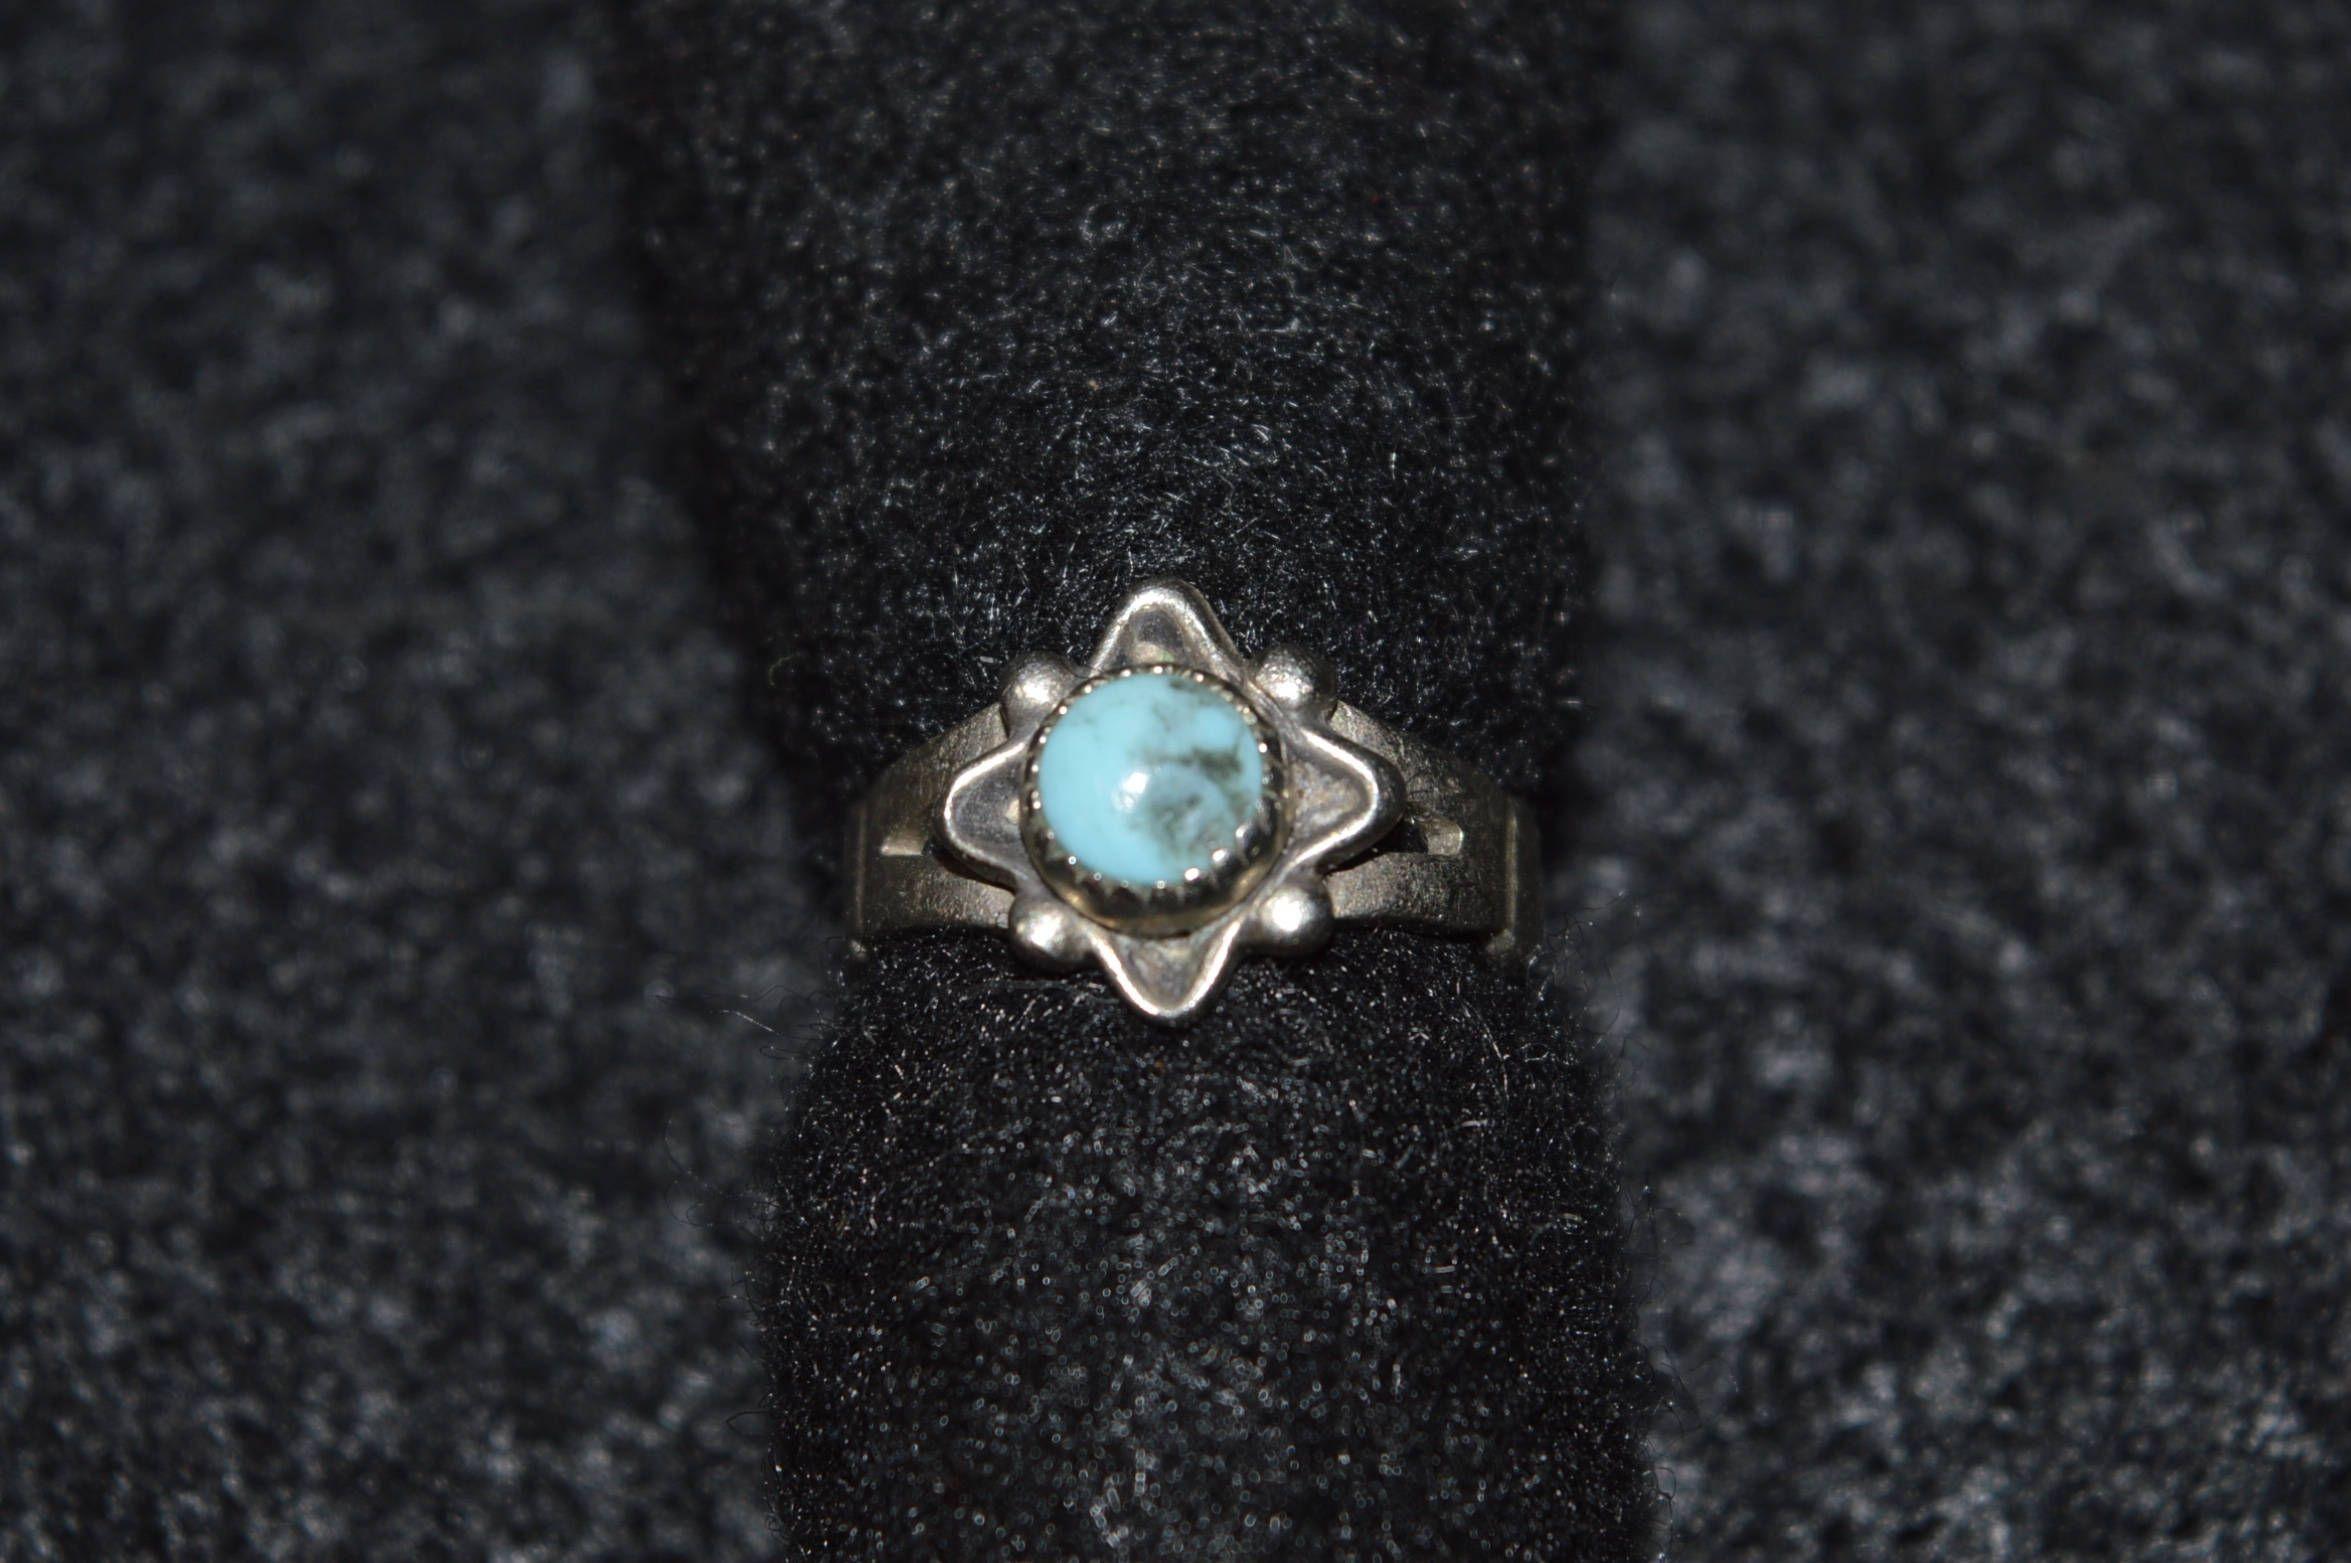 Tiny sun symbol southwestern ring navajo turquoise ring size 25 tiny sun symbol southwestern ring navajo turquoise ring size 25 ring tiny ring buycottarizona Images